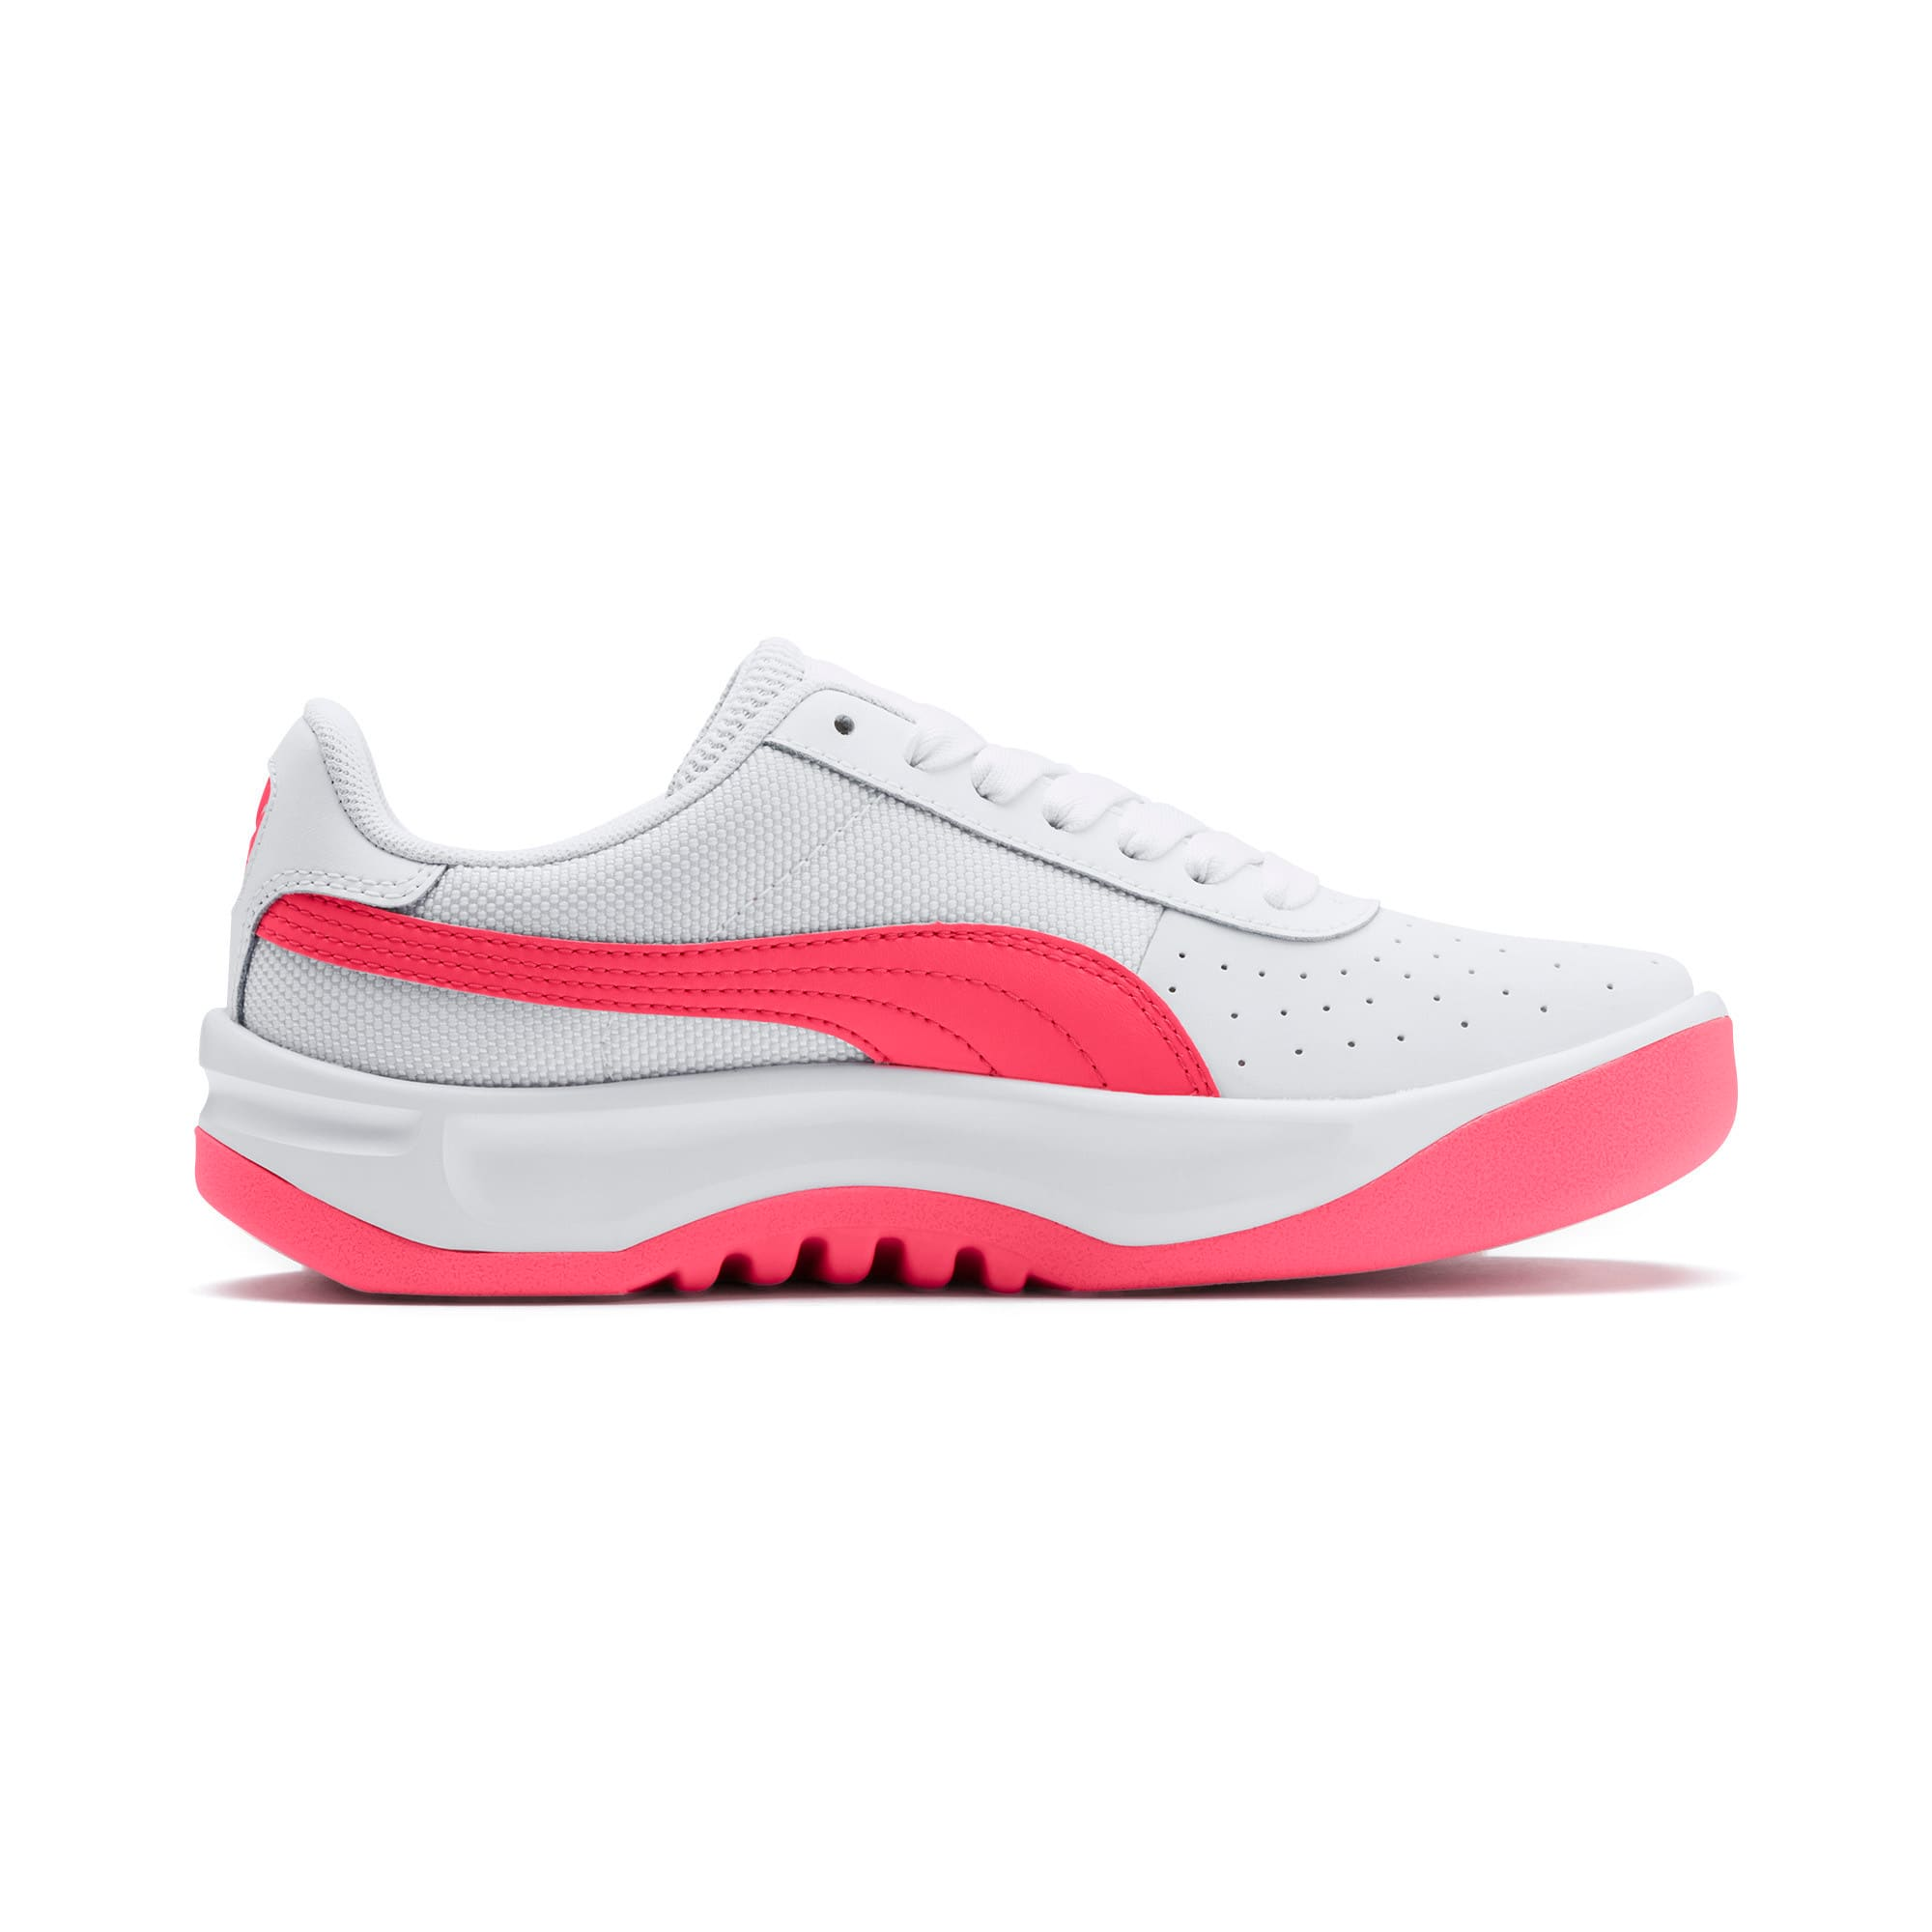 Thumbnail 5 of California Sneakers JR, Puma White-Pink Alert, medium